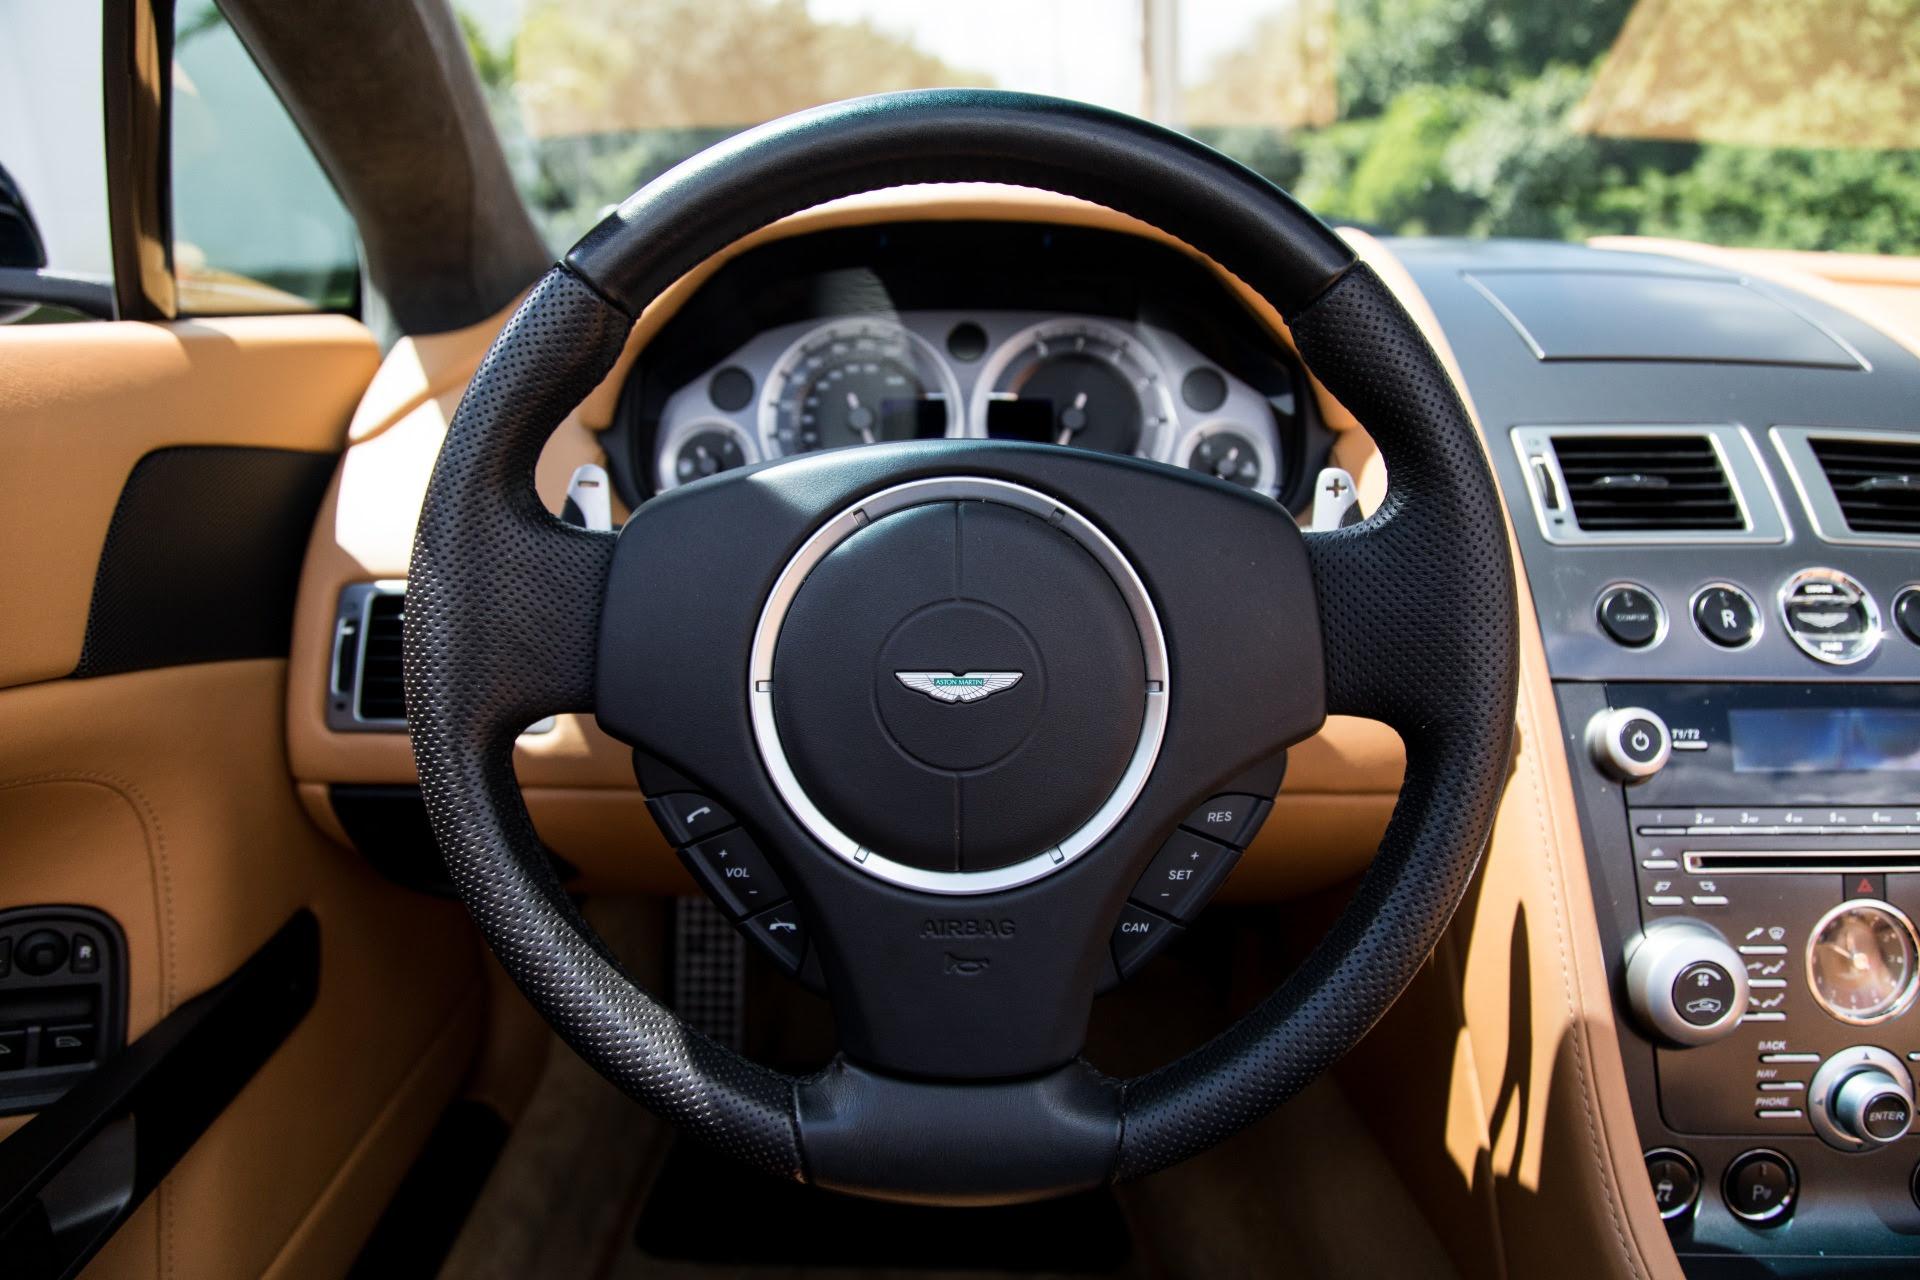 Used 2009 Aston Martin V8 Vantage Roadster For Sale 49 900 Marino Performance Motors Stock 012416